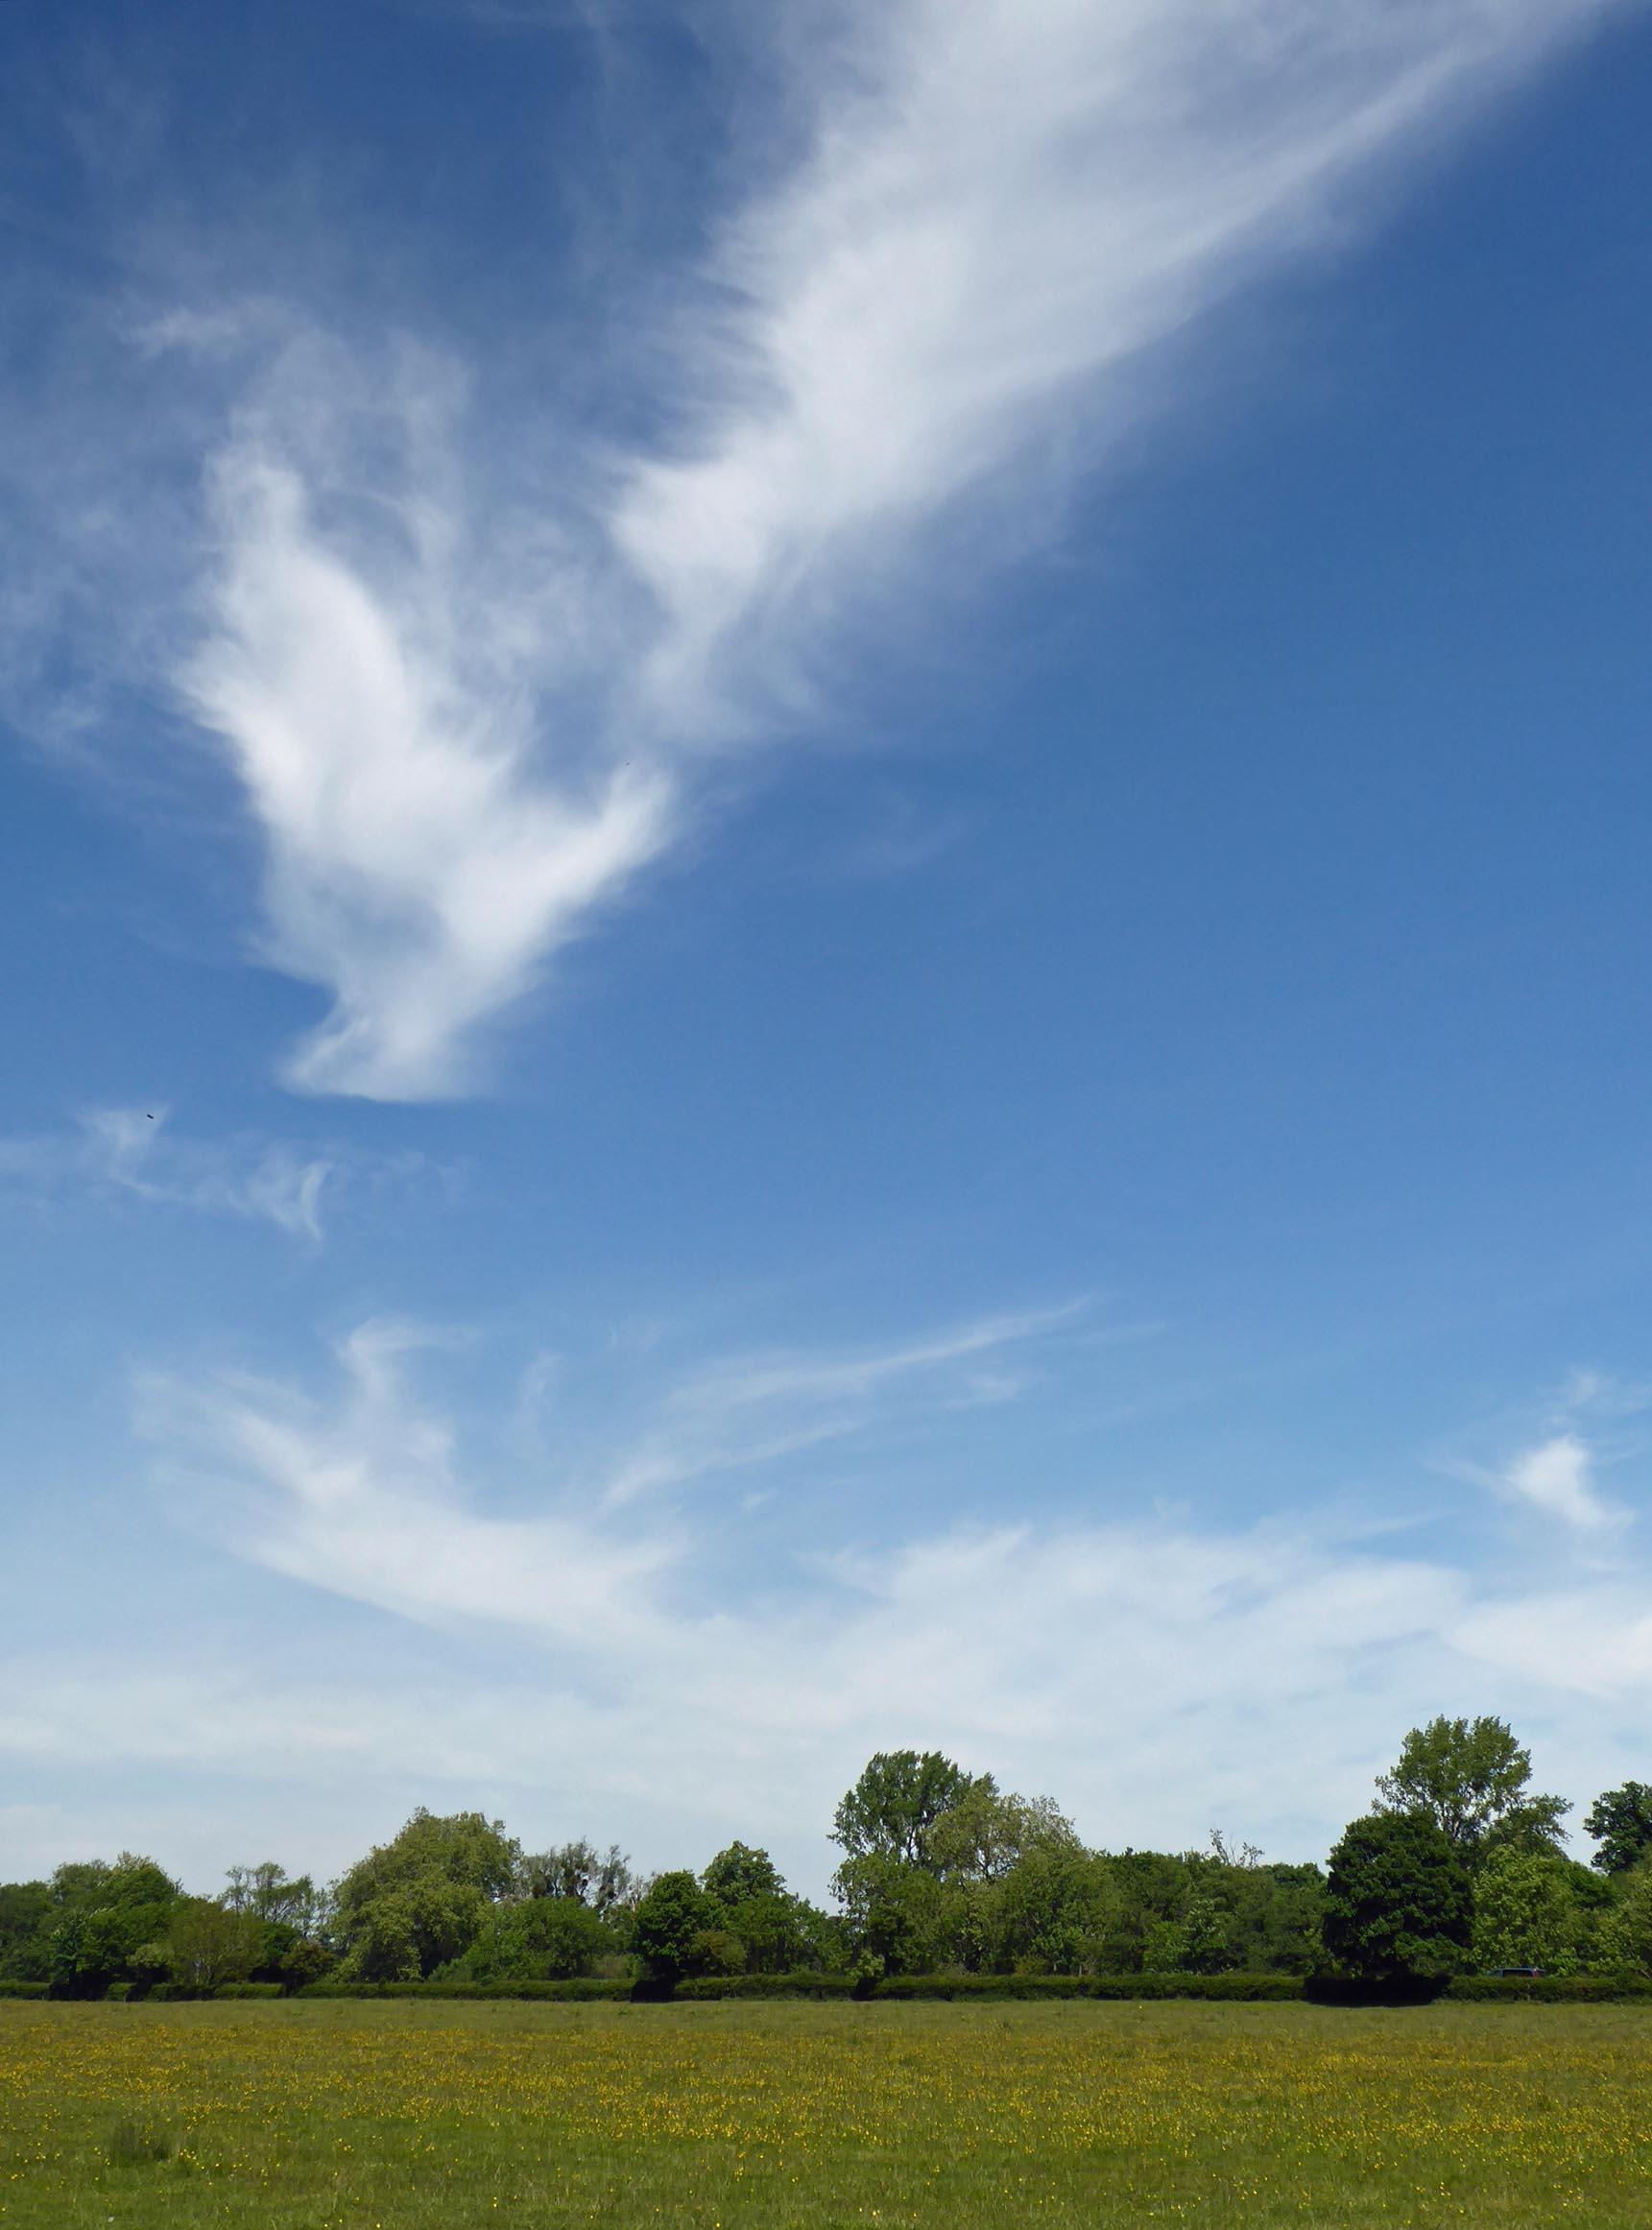 Blue sky, white clouds, green field below